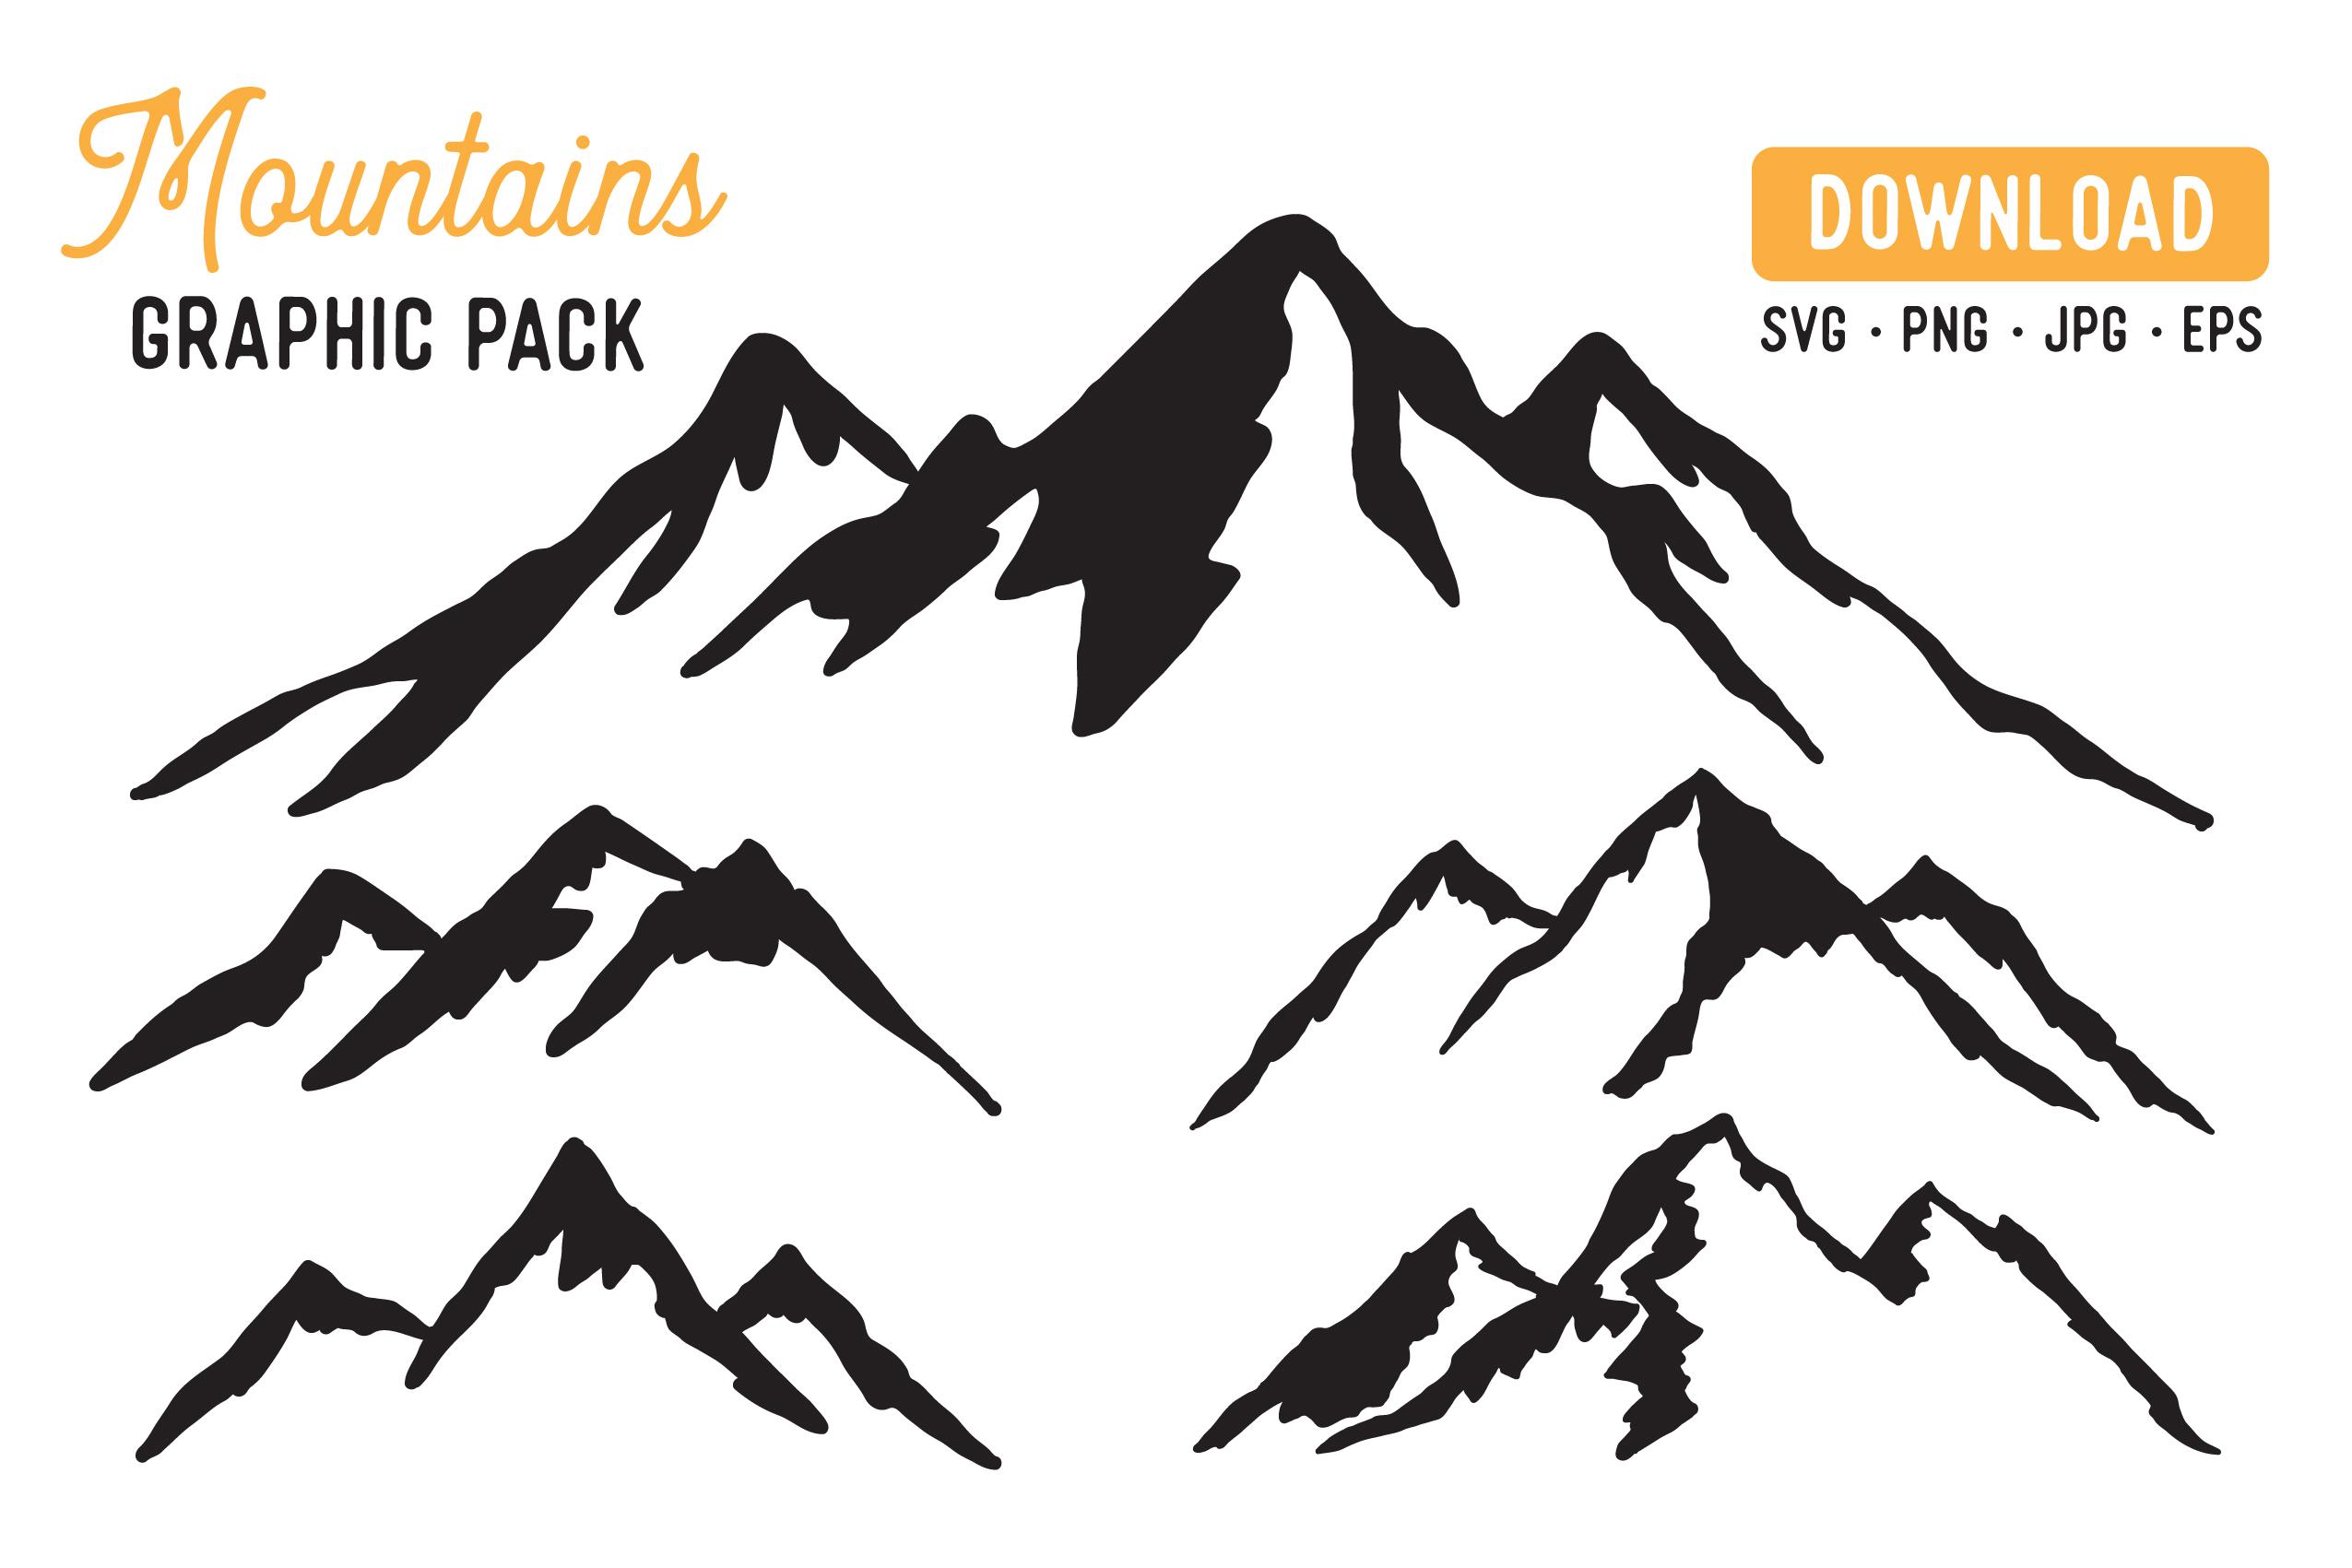 Mountain Vector SVG Bundle - Mountain Graphic Bundle example image 1